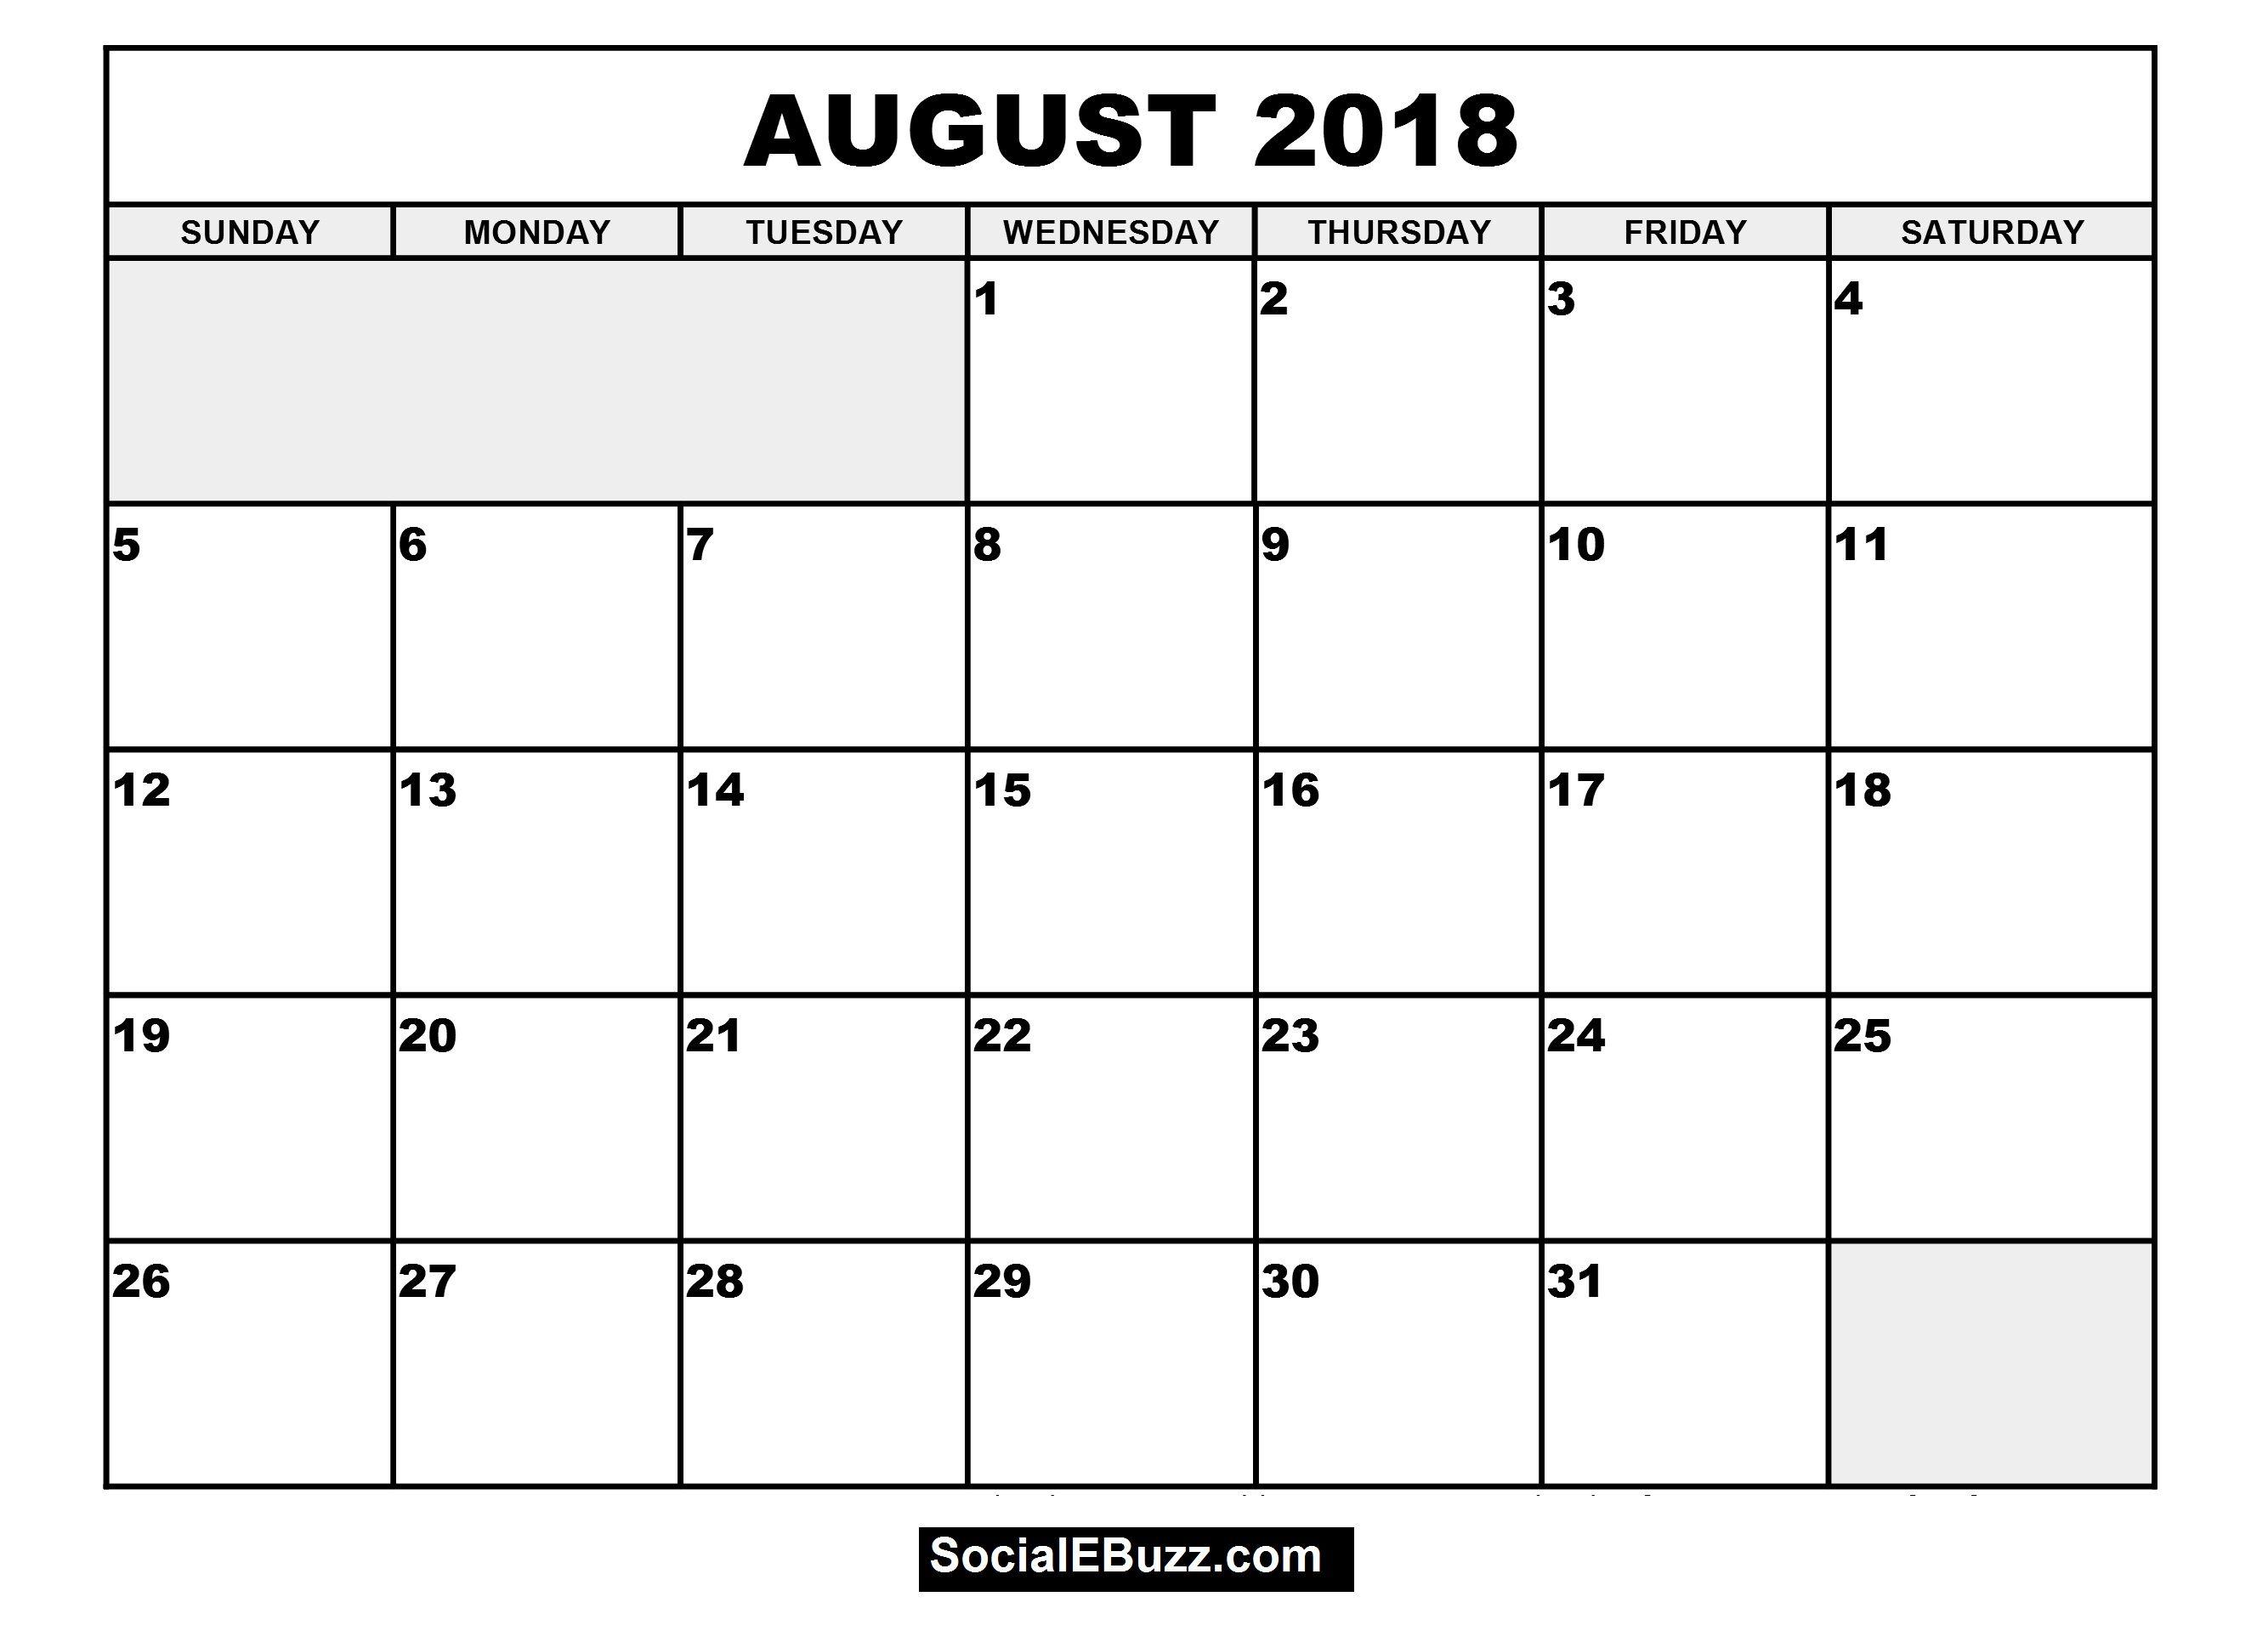 August 2018 Calendar Printable Template   August 2018 Calendar Blank for Printable Monthly Calendar Templates August